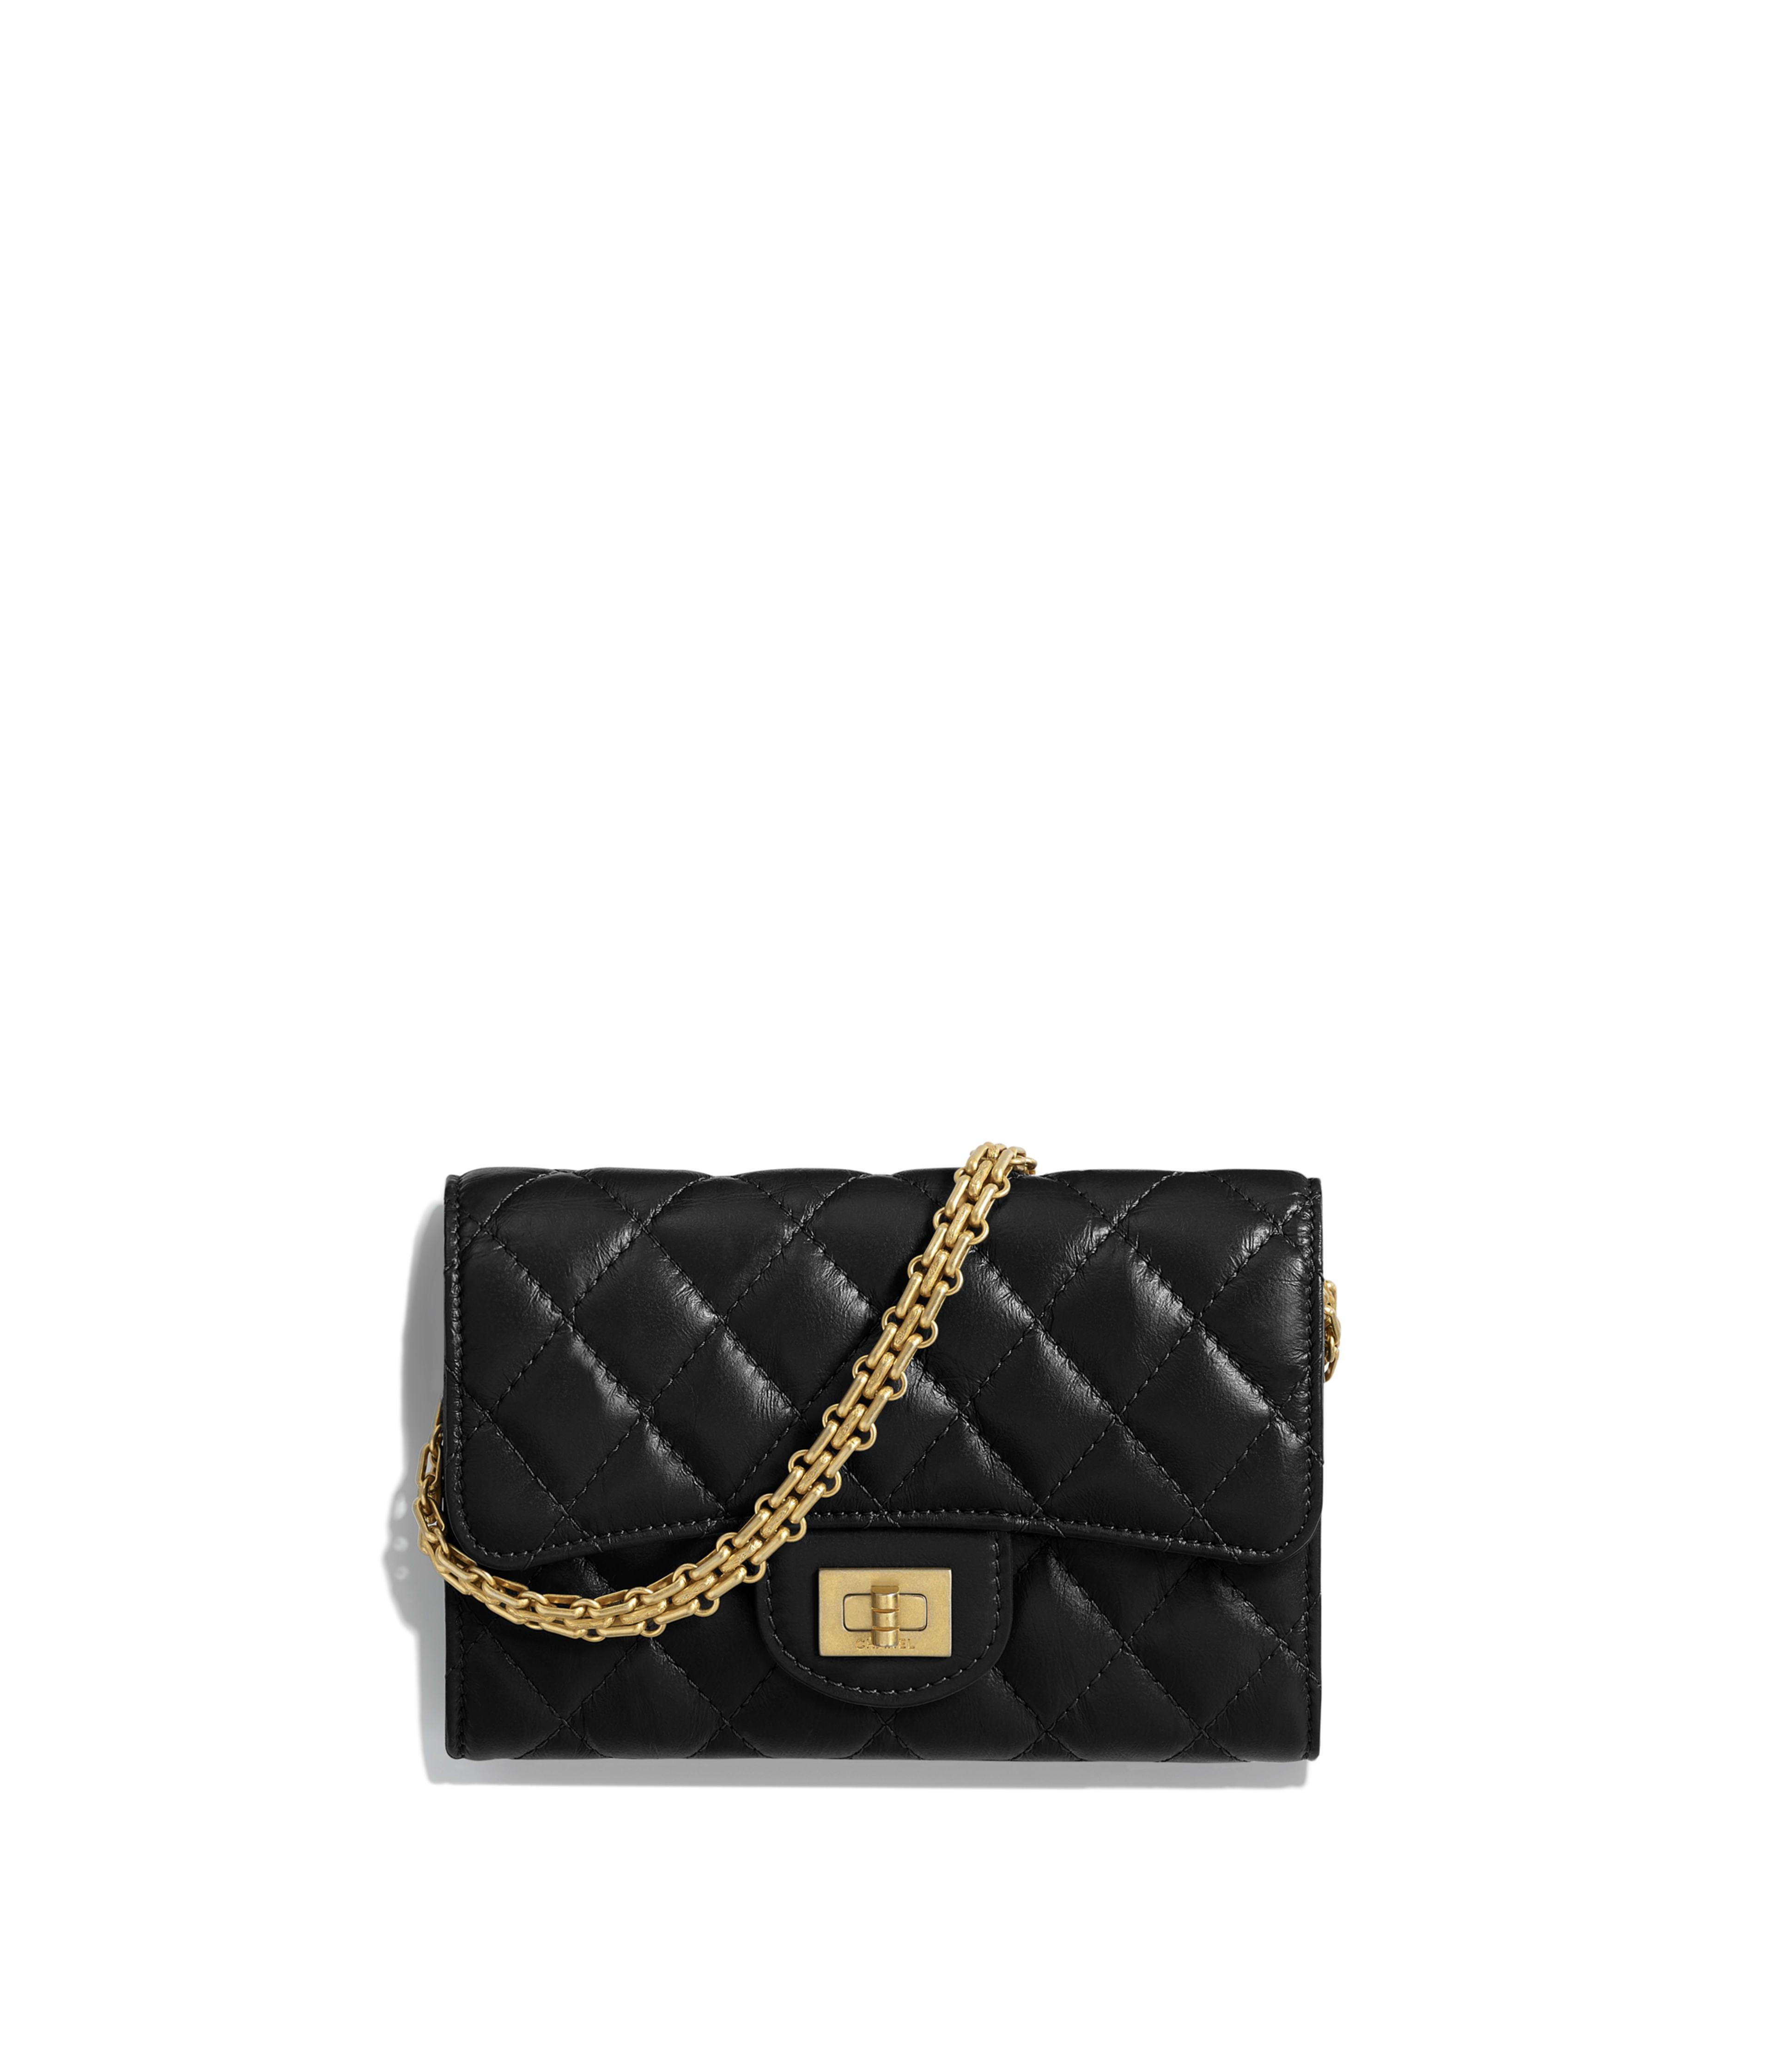 e9a3d2c4331e Small Chanel Purse With Chain - Best Purse Image Ccdbb.Org